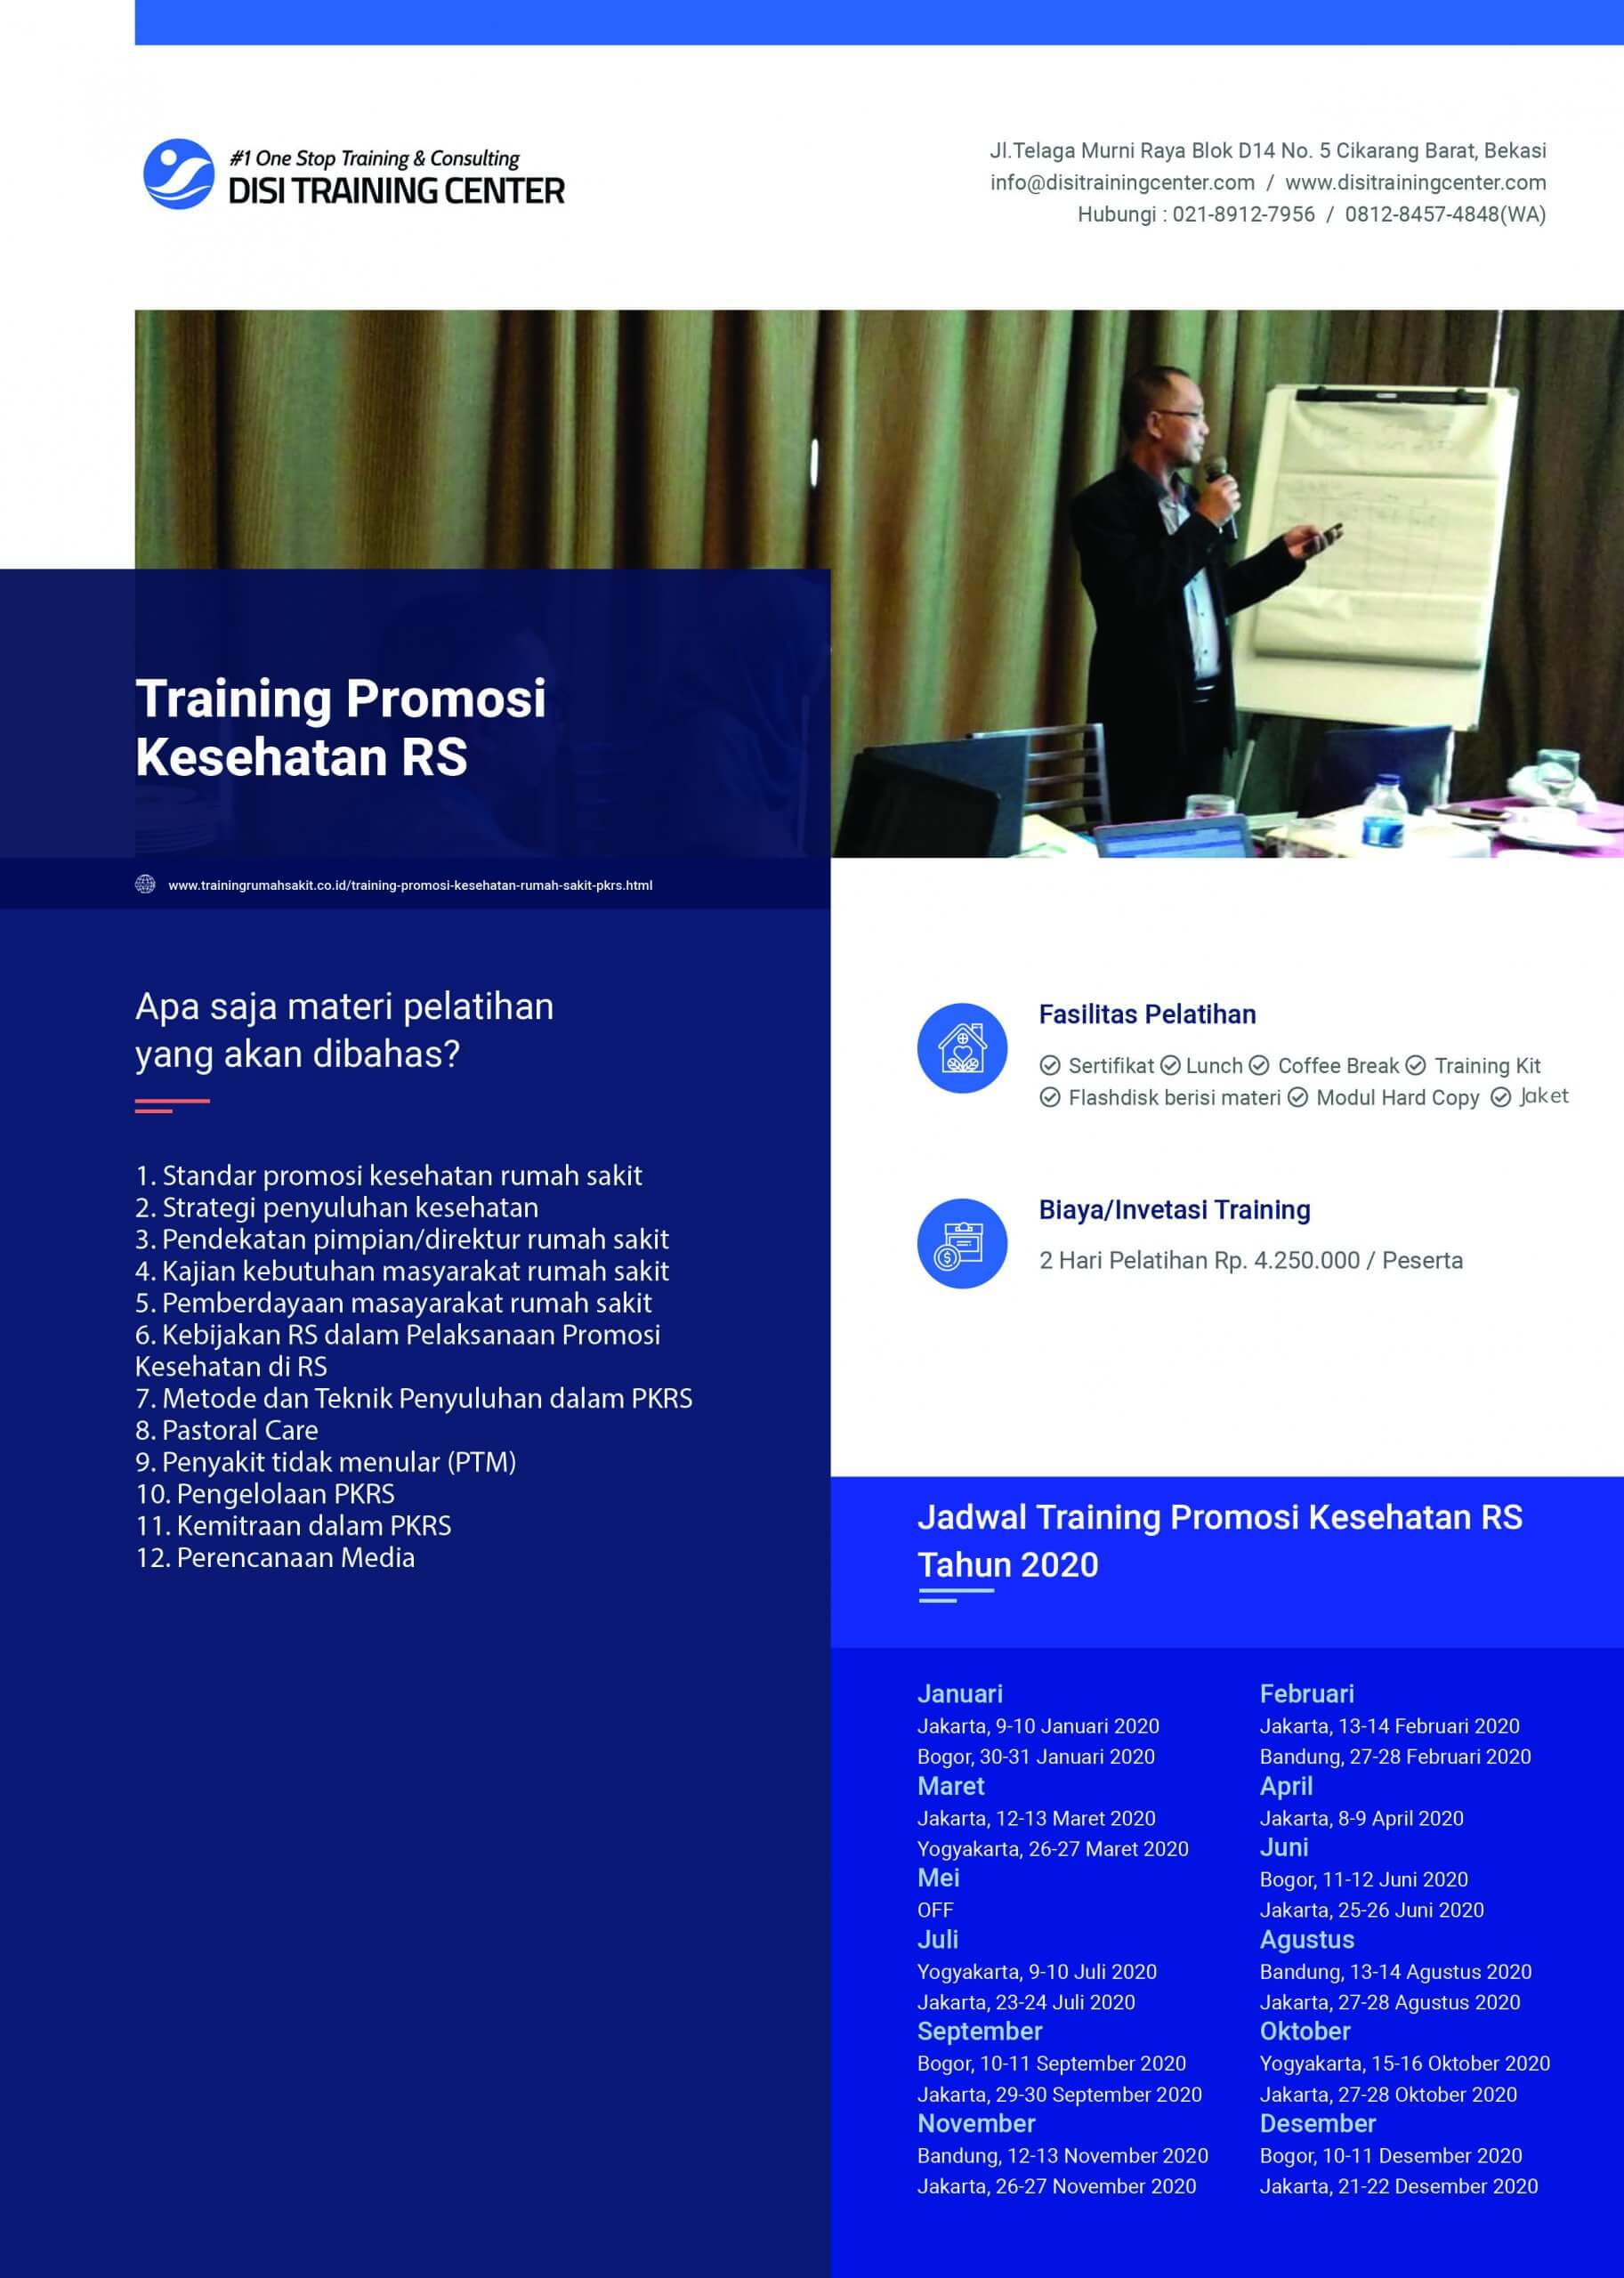 Training Promosi Kesehatan Rumah Sakit